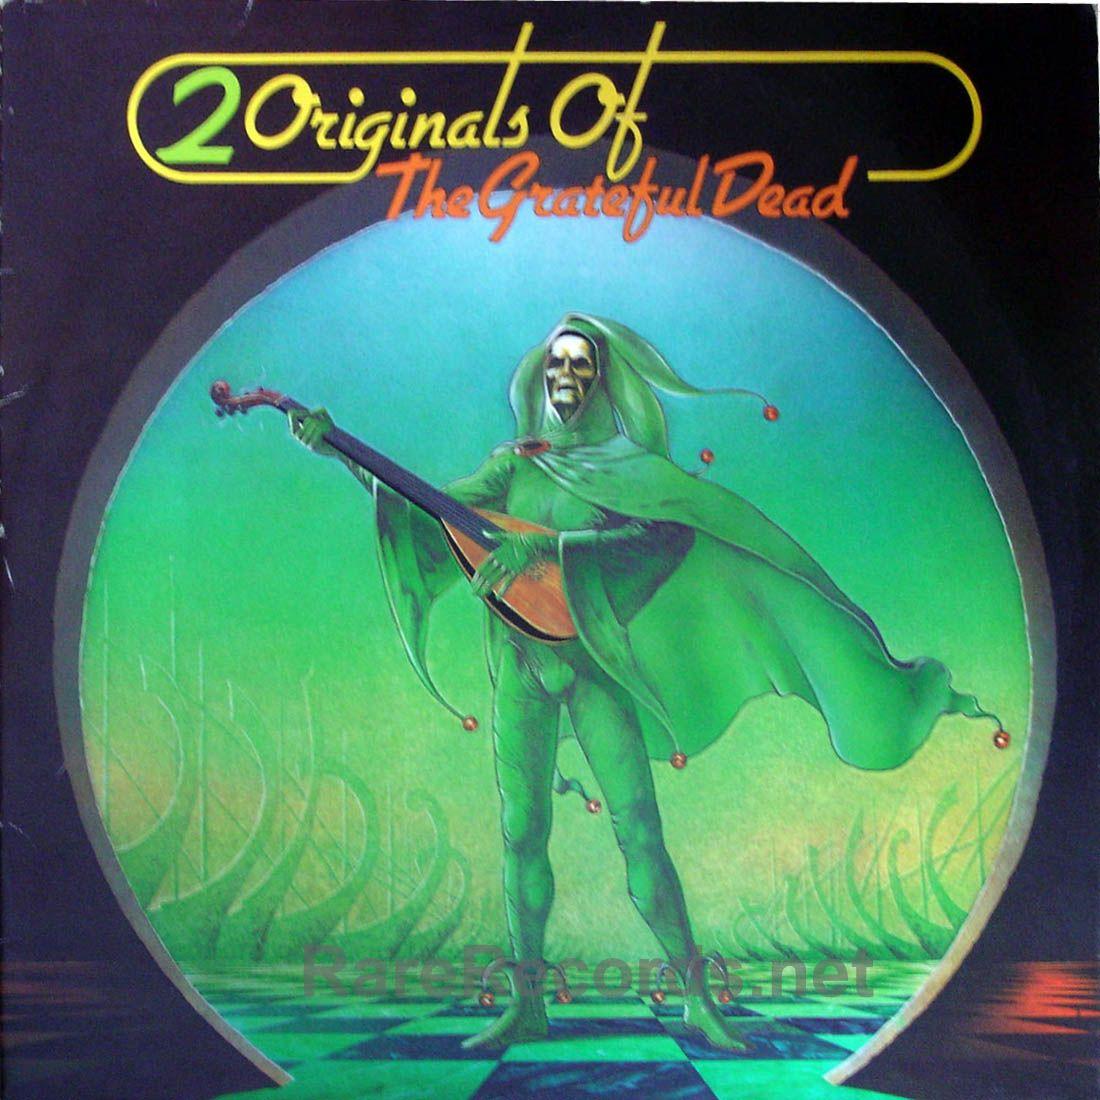 The Grateful Dead 2 Originals Of The Grateful Dead Obscure